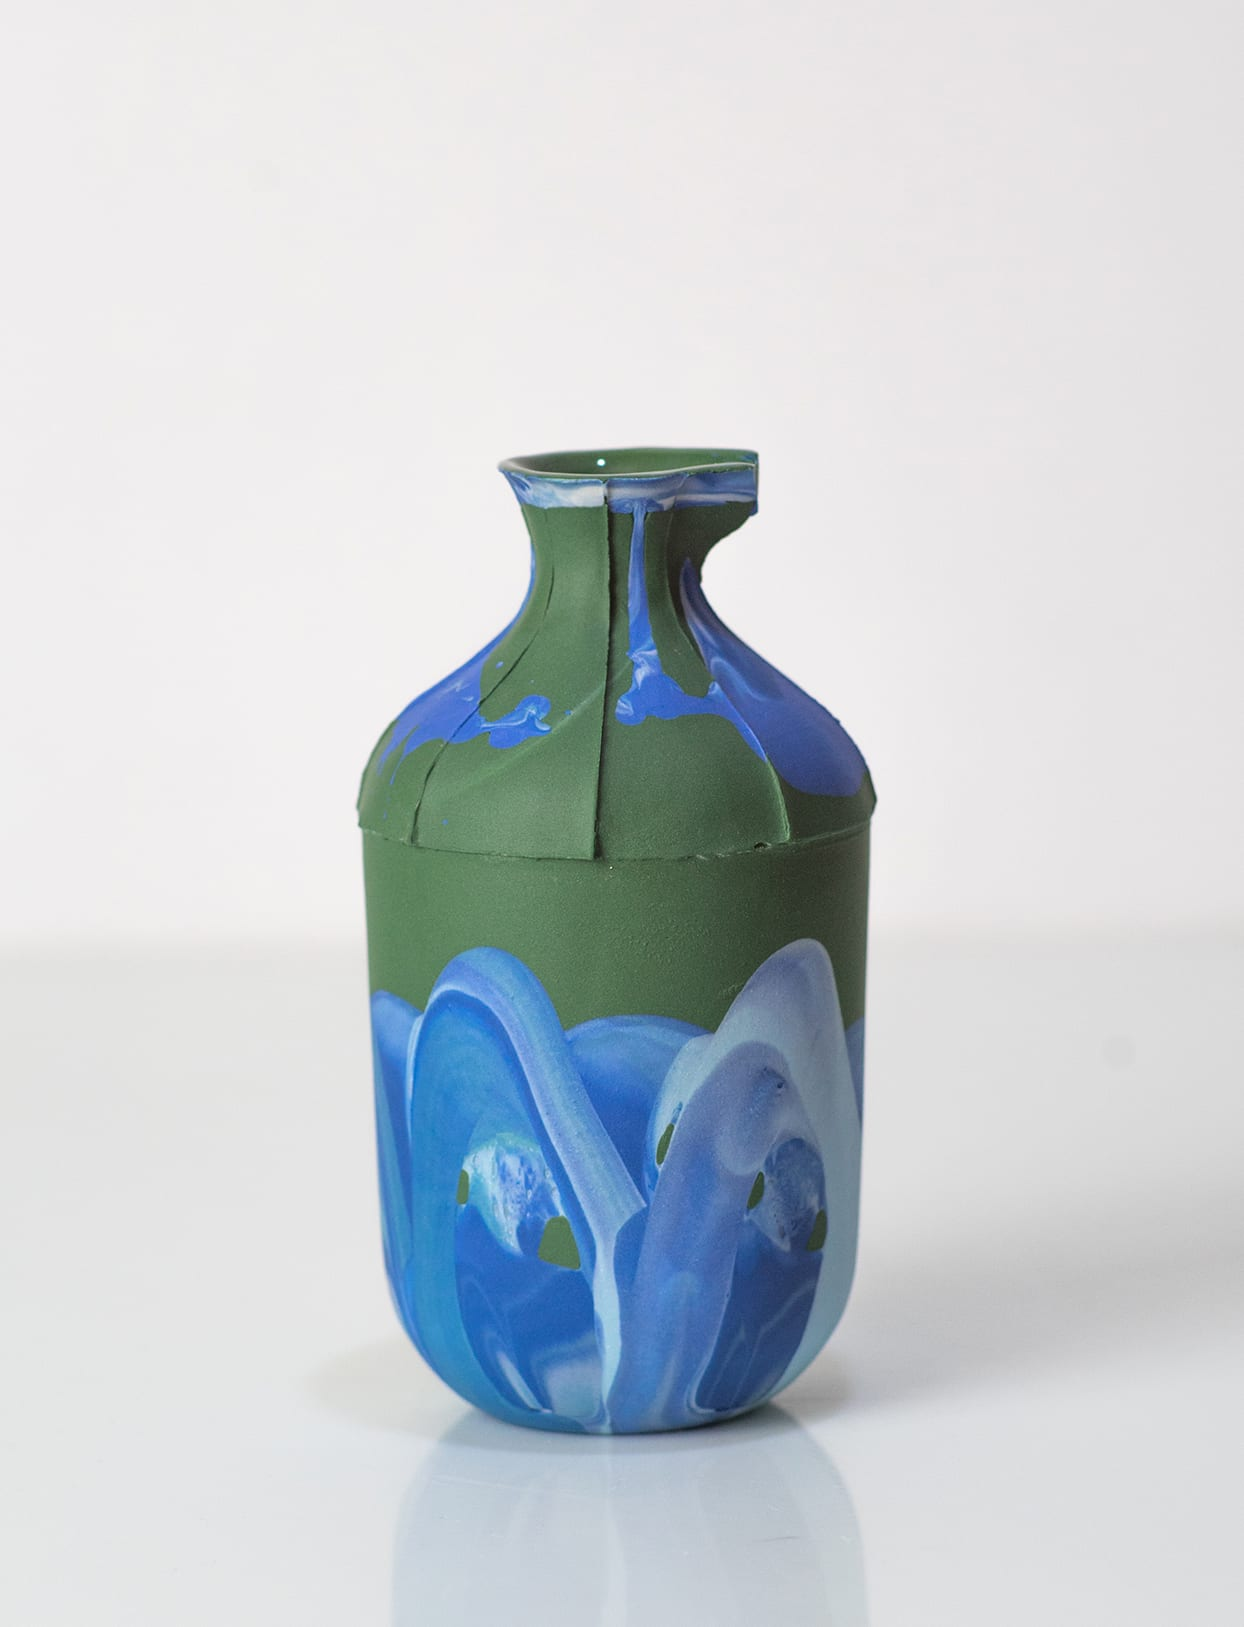 "<span class=""link fancybox-details-link""><a href=""/artists/219-james-pegg/works/6080-james-pegg-bottle-2019/"">View Detail Page</a></span><div class=""artist""><strong>James Pegg</strong></div> <div class=""title""><em>Bottle</em>, 2019</div> <div class=""medium"">action-cast stained porcelain with glazed interior</div> <div class=""dimensions"">h 12 cm, dia 6 cm</div><div class=""price"">£90.00</div>"